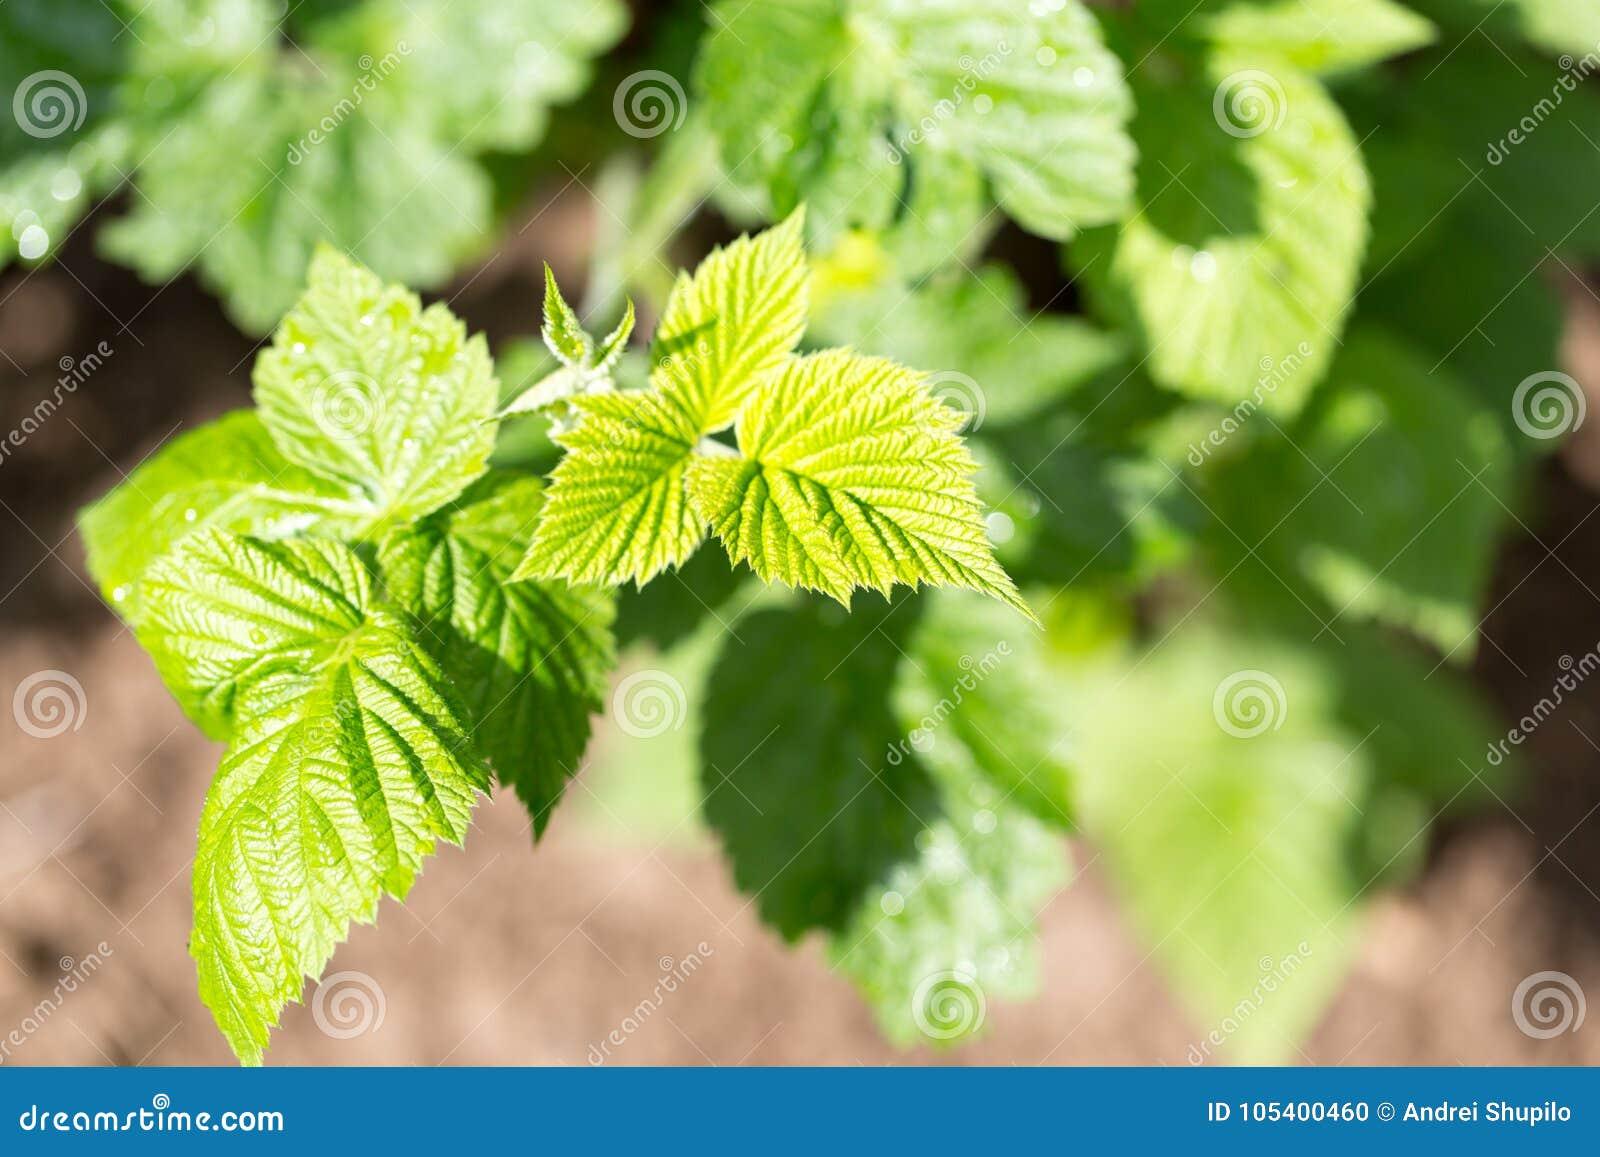 Download Νέα φύλλα σμέουρων στη φύση Στοκ Εικόνες - εικόνα από διακόσμηση, floral: 105400460